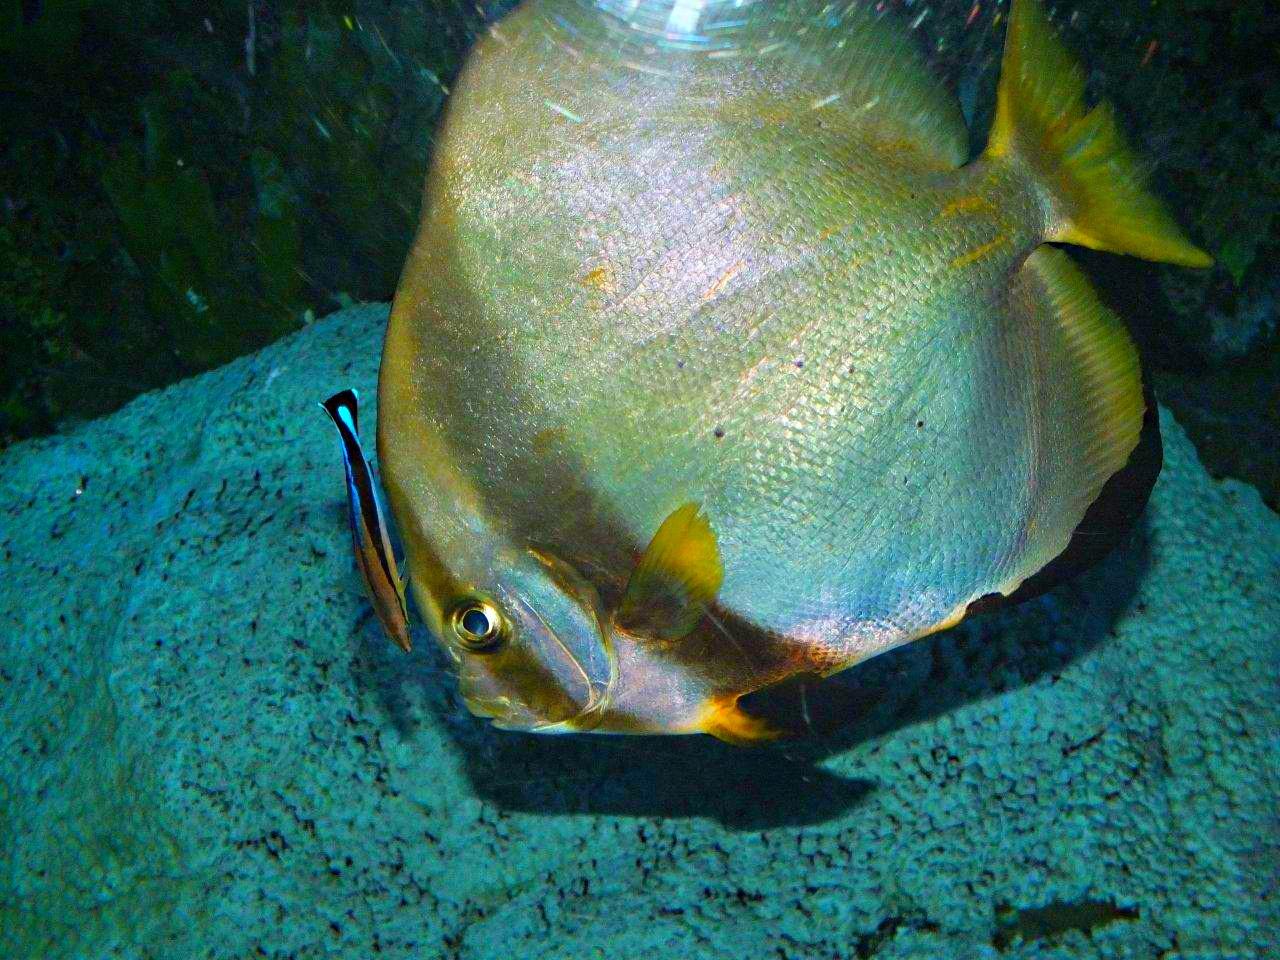 Bluestreak Cleaner Wrasse... saltwater fish... photo by Thomas Peace 2013